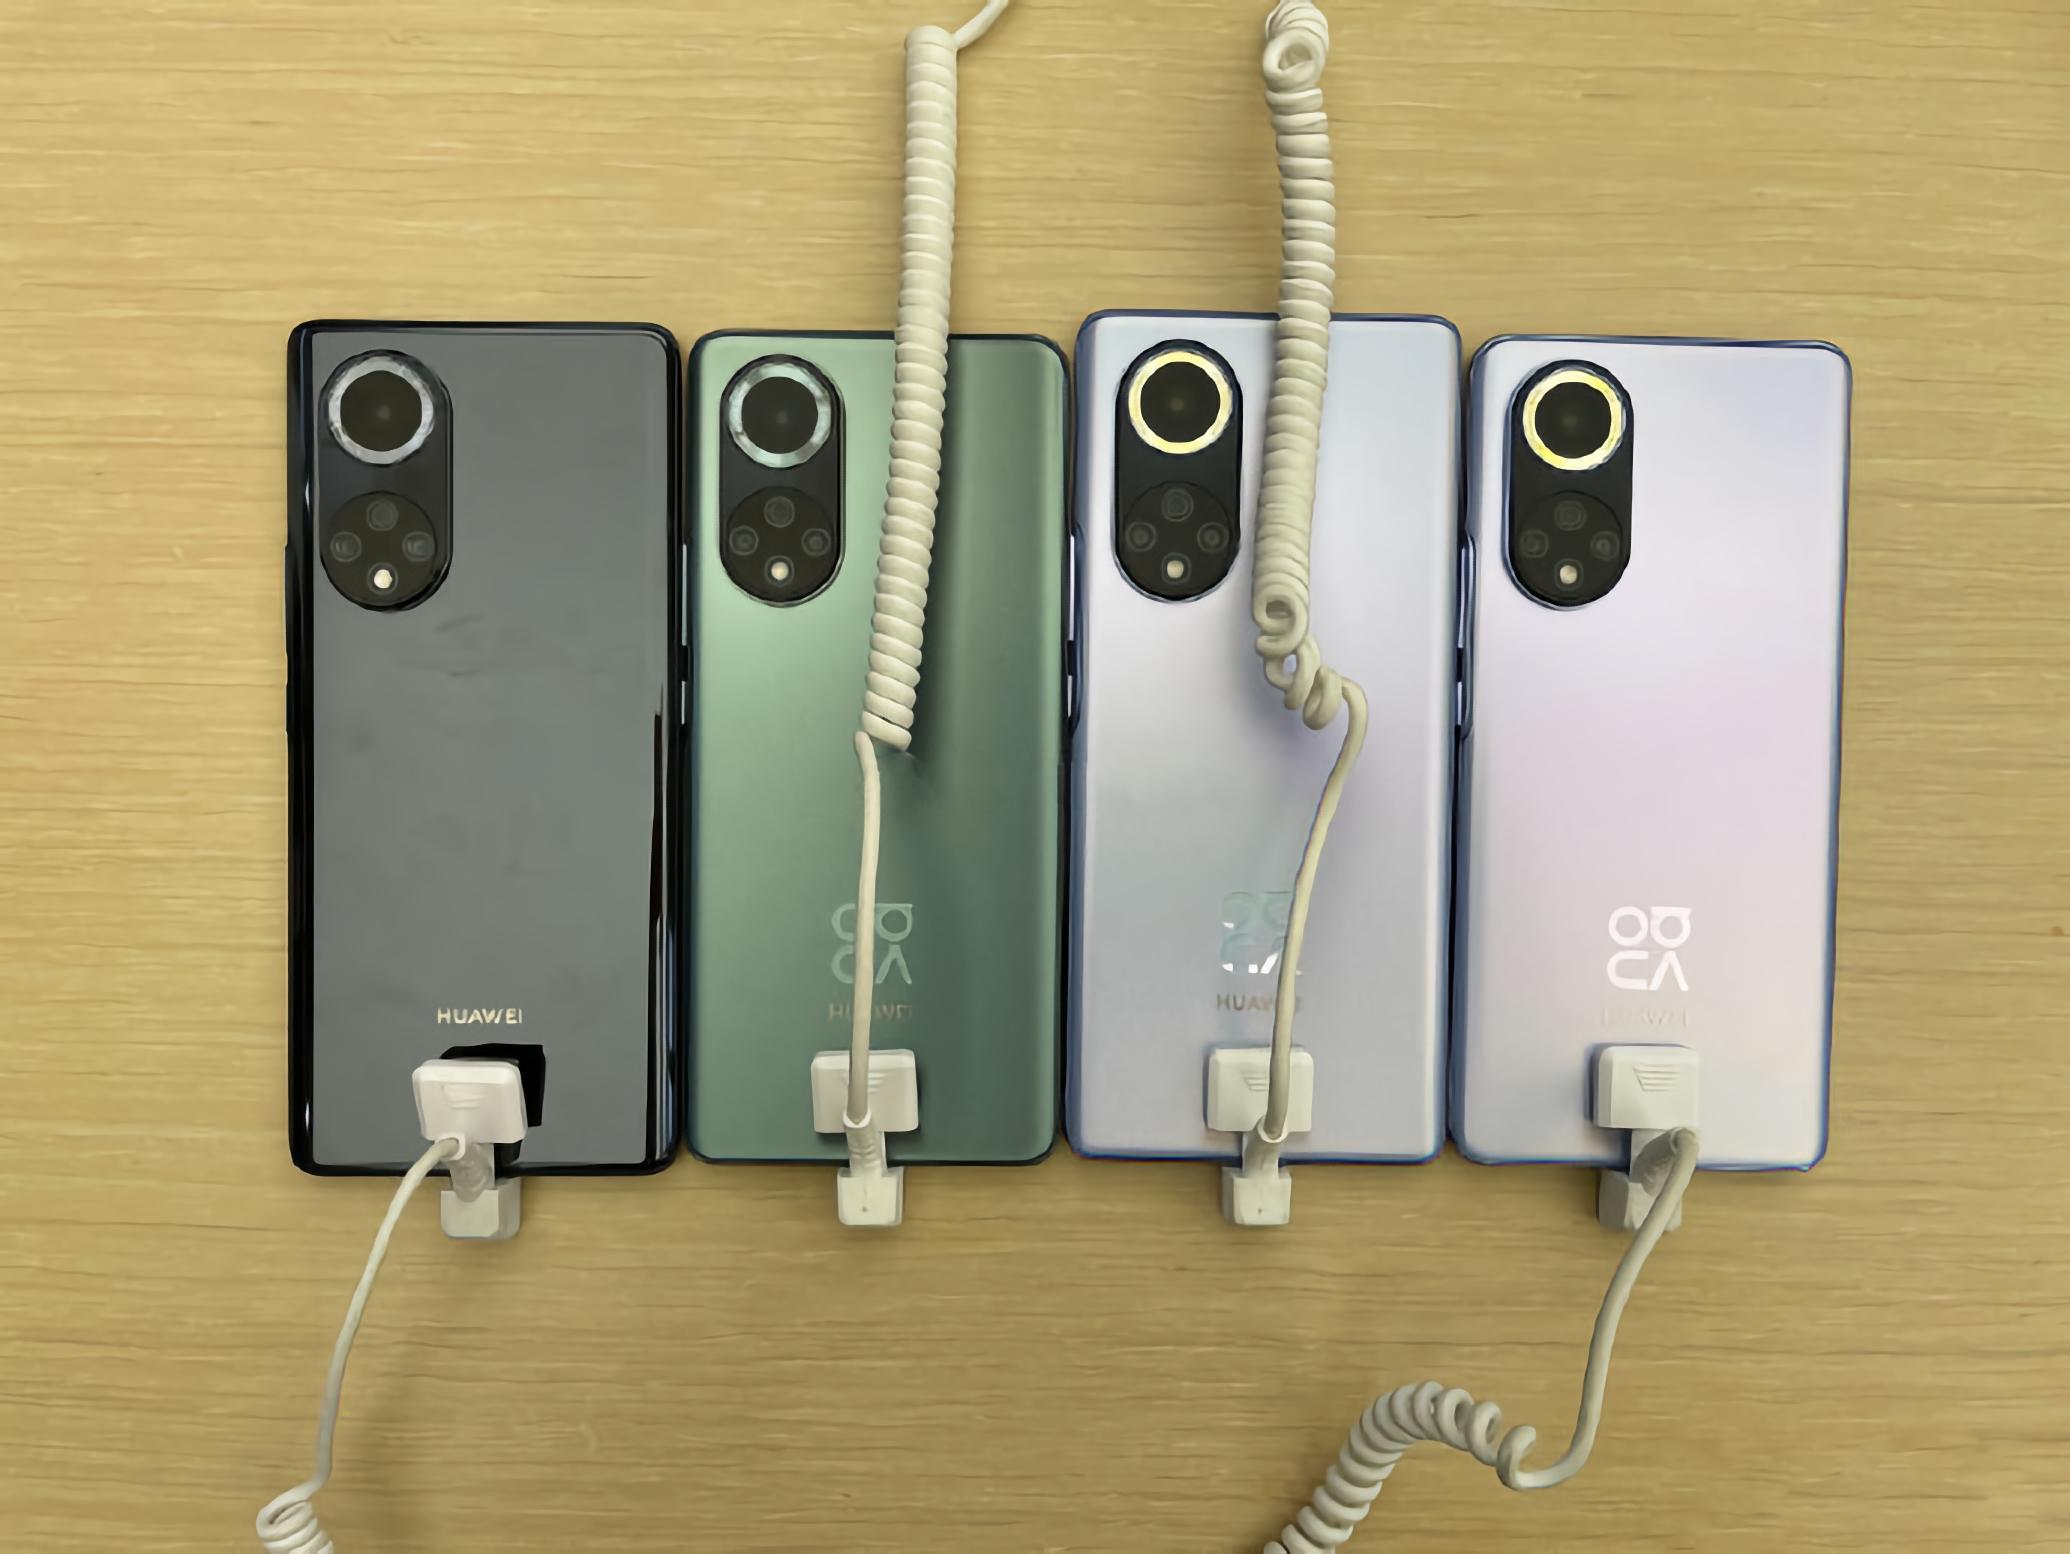 За два дня до анонса: инсайдер опубликовал подробные характеристики смартфонов Huawei Nova 9 и Huawei Nova 9 Pro